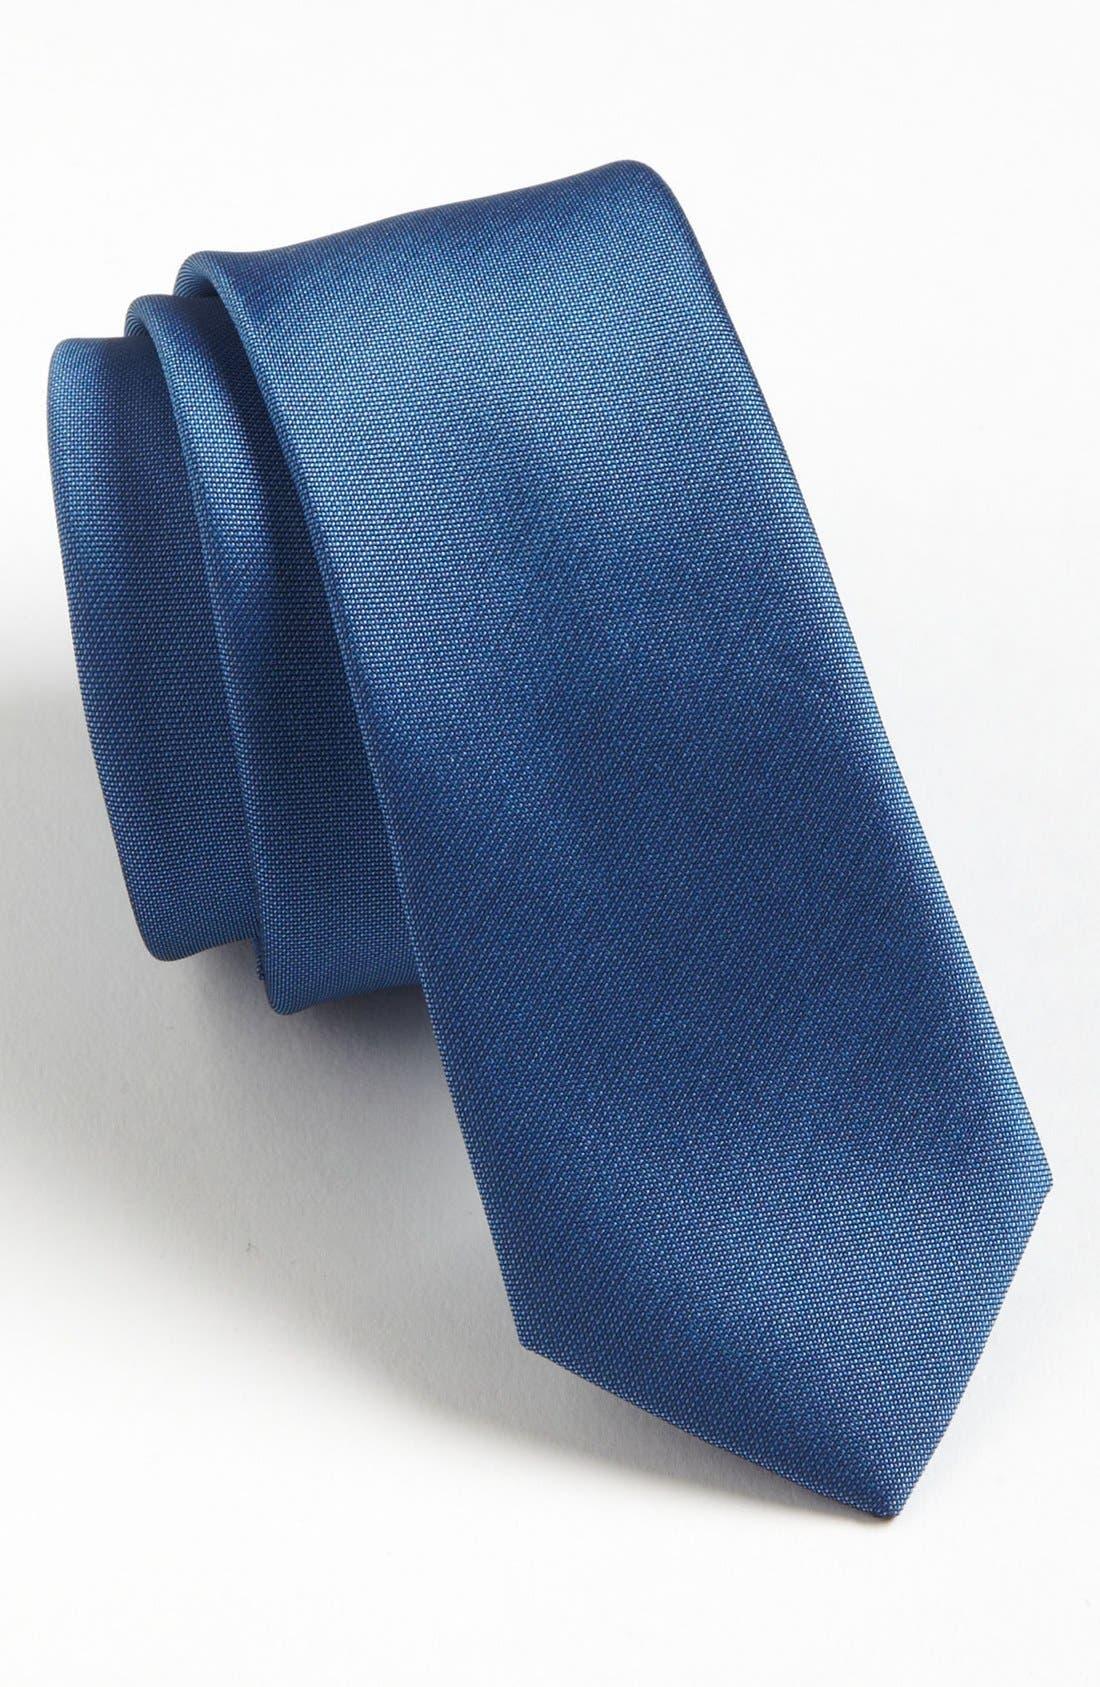 Main Image - Topman 'Spring' Skinnny Woven Tie